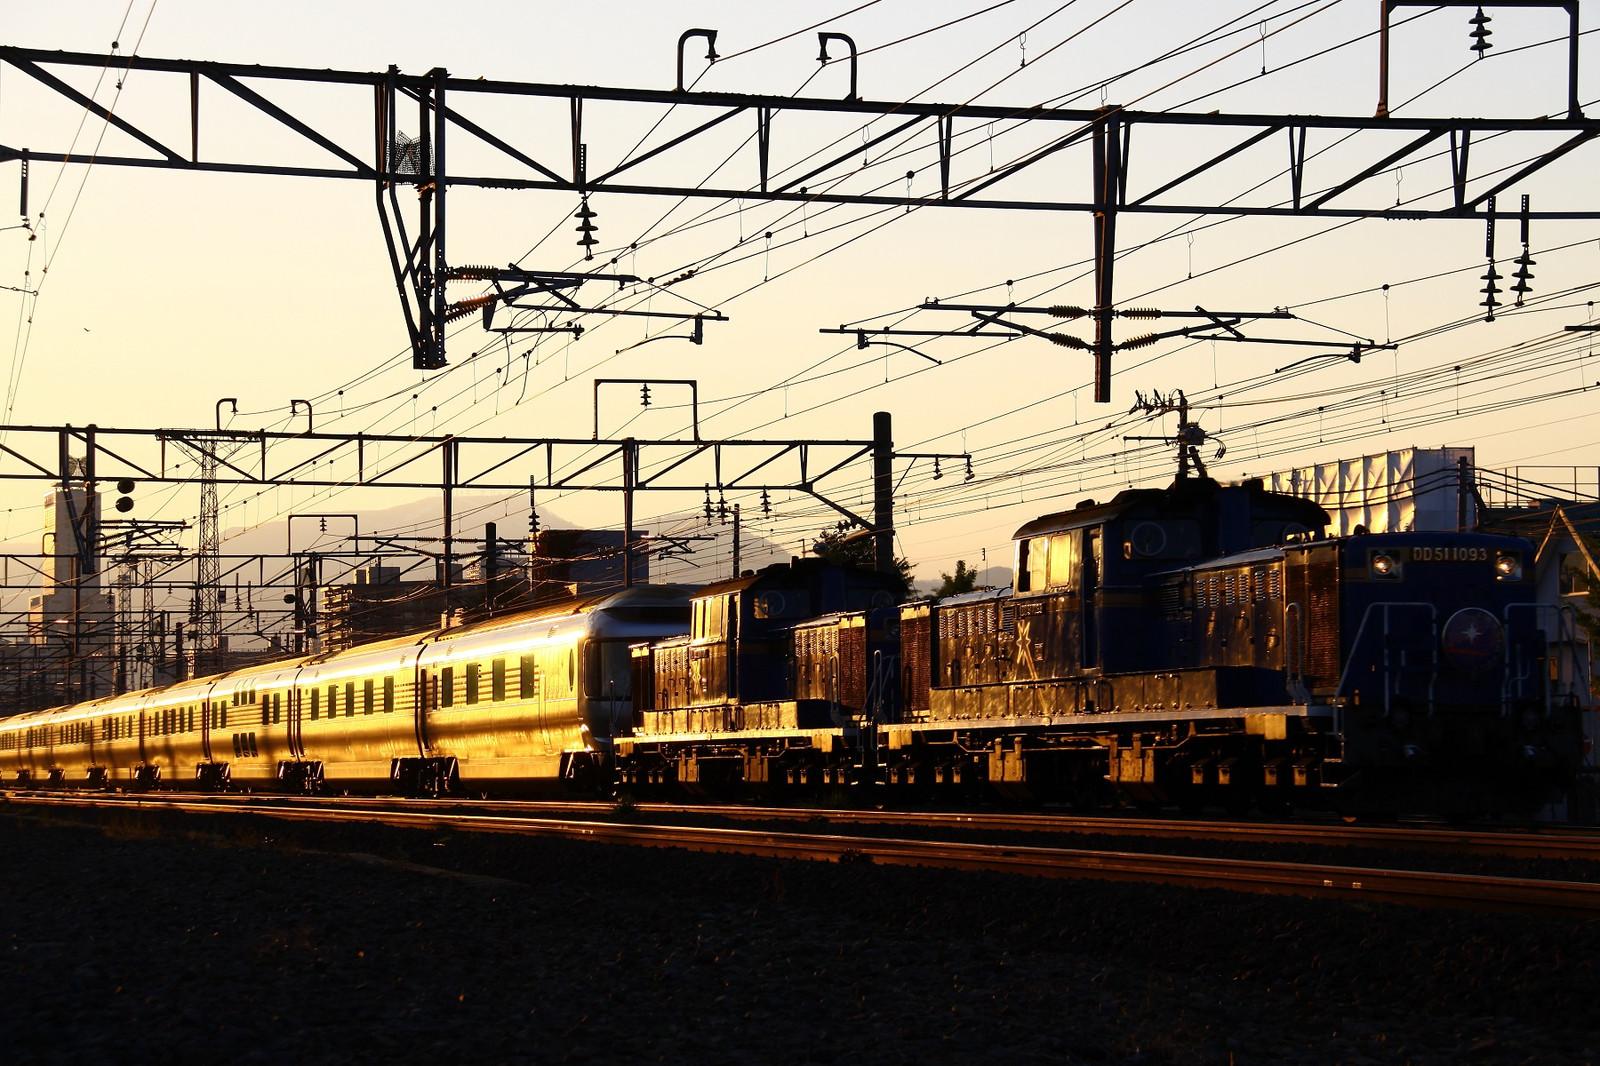 Jr1310191001